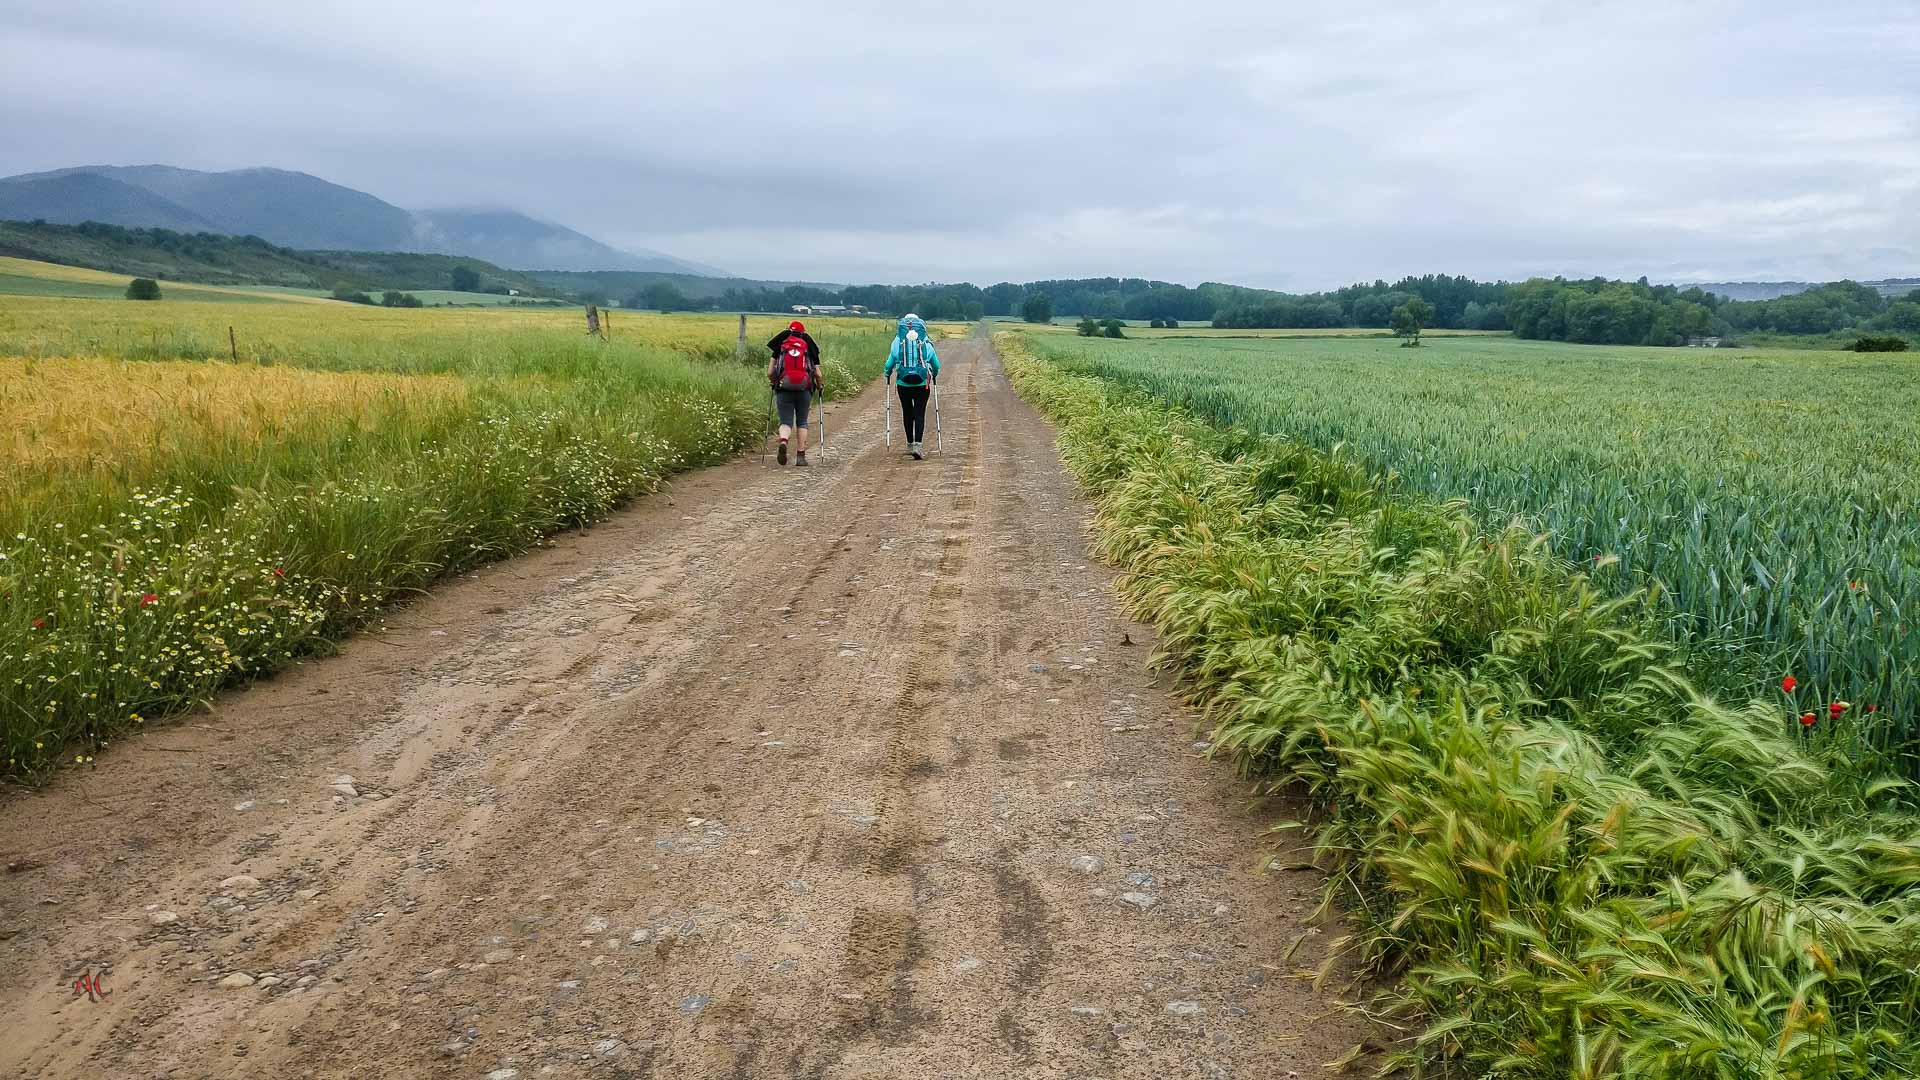 etapa del camino Aragonés, Arres a Artieda